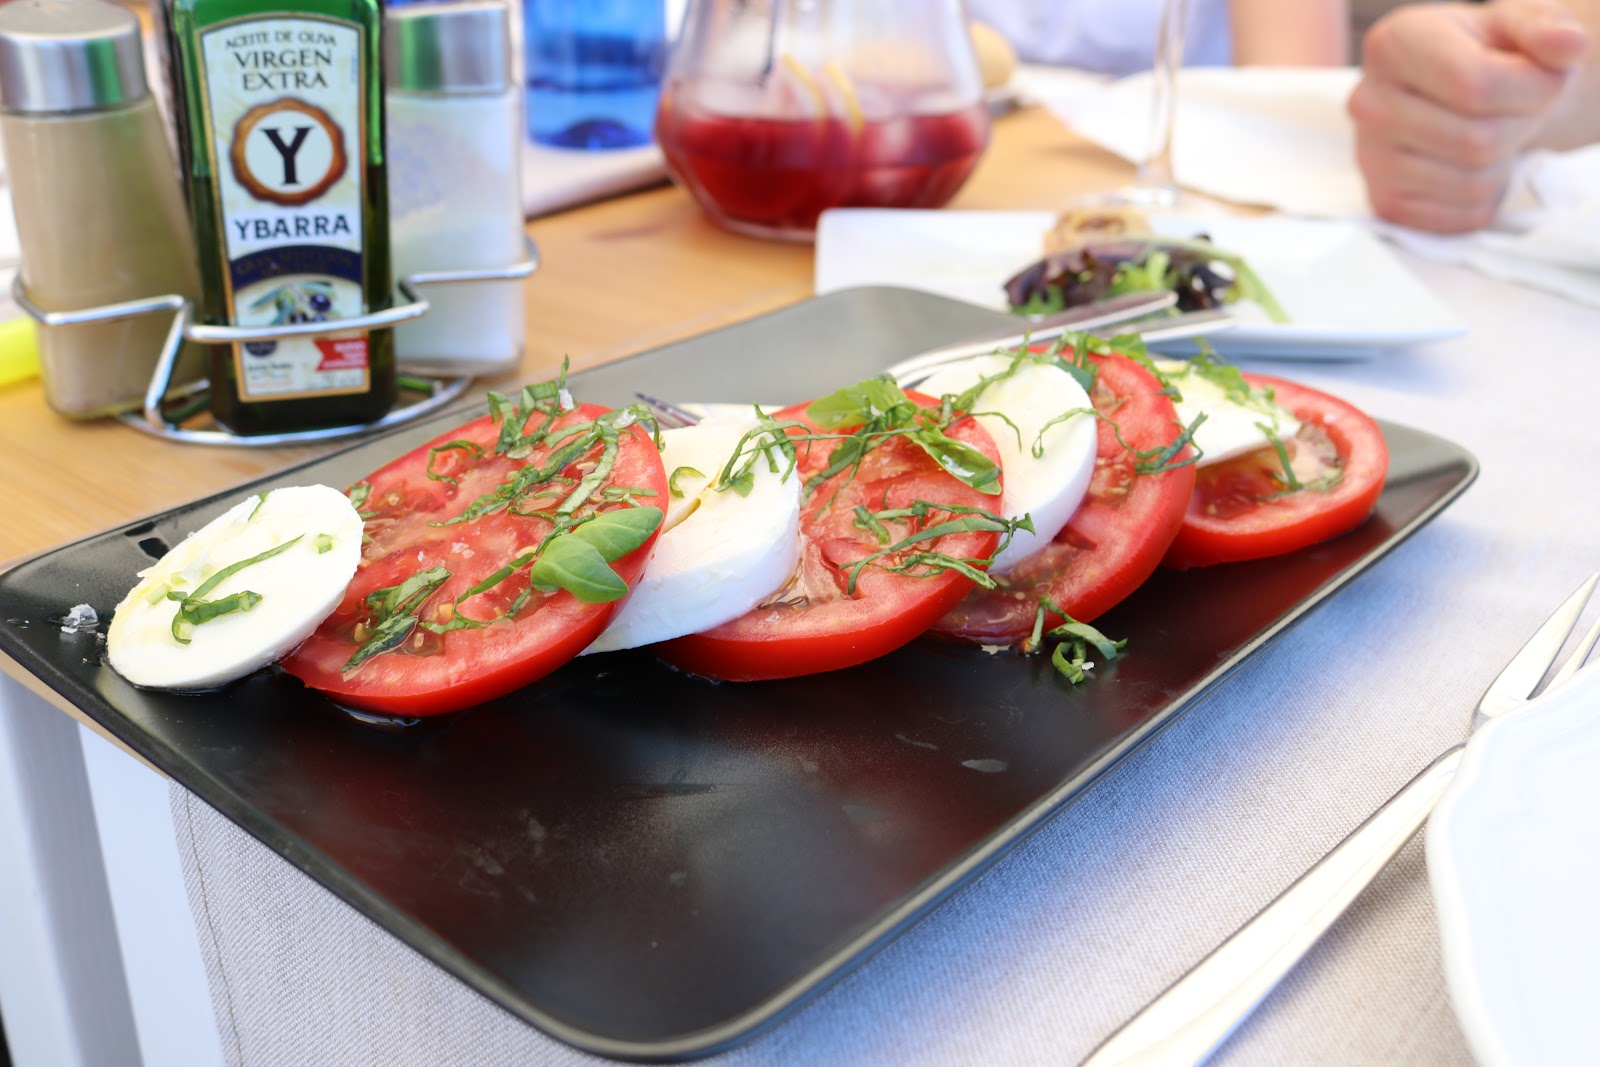 Mozerella and Tomatoes, Mar Sana, Sotogrande, Spain